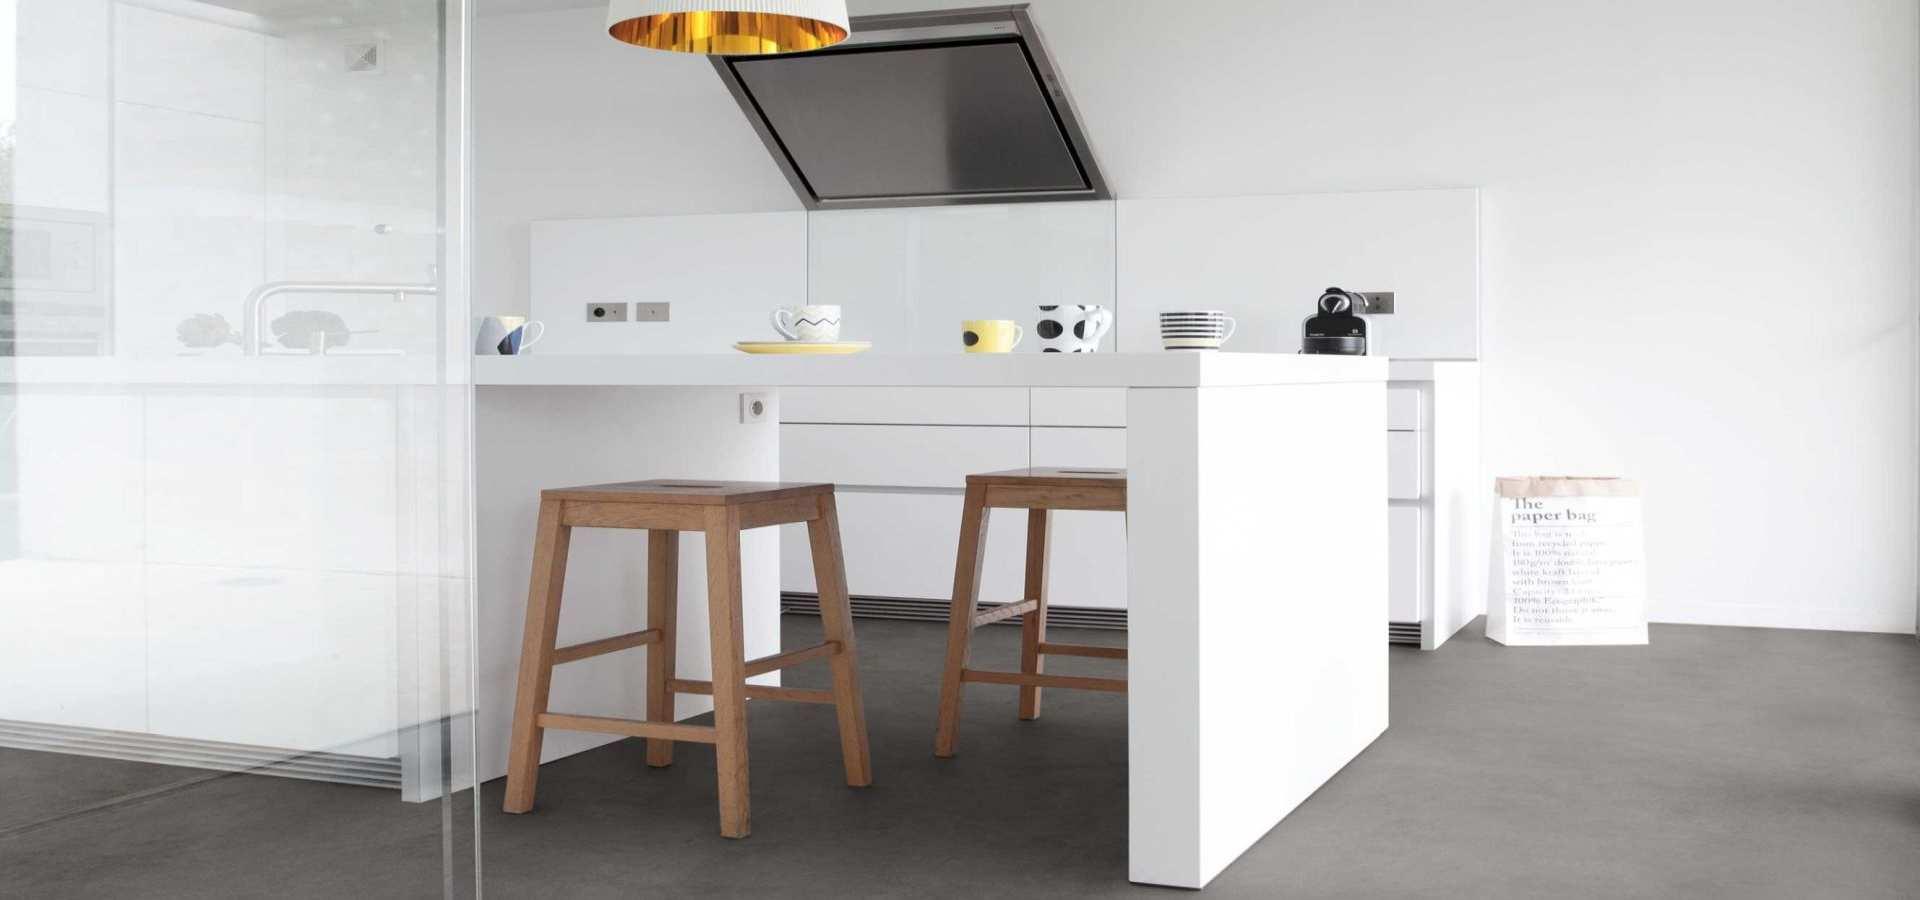 Bild Küche mit CV Belag betonoptik grau